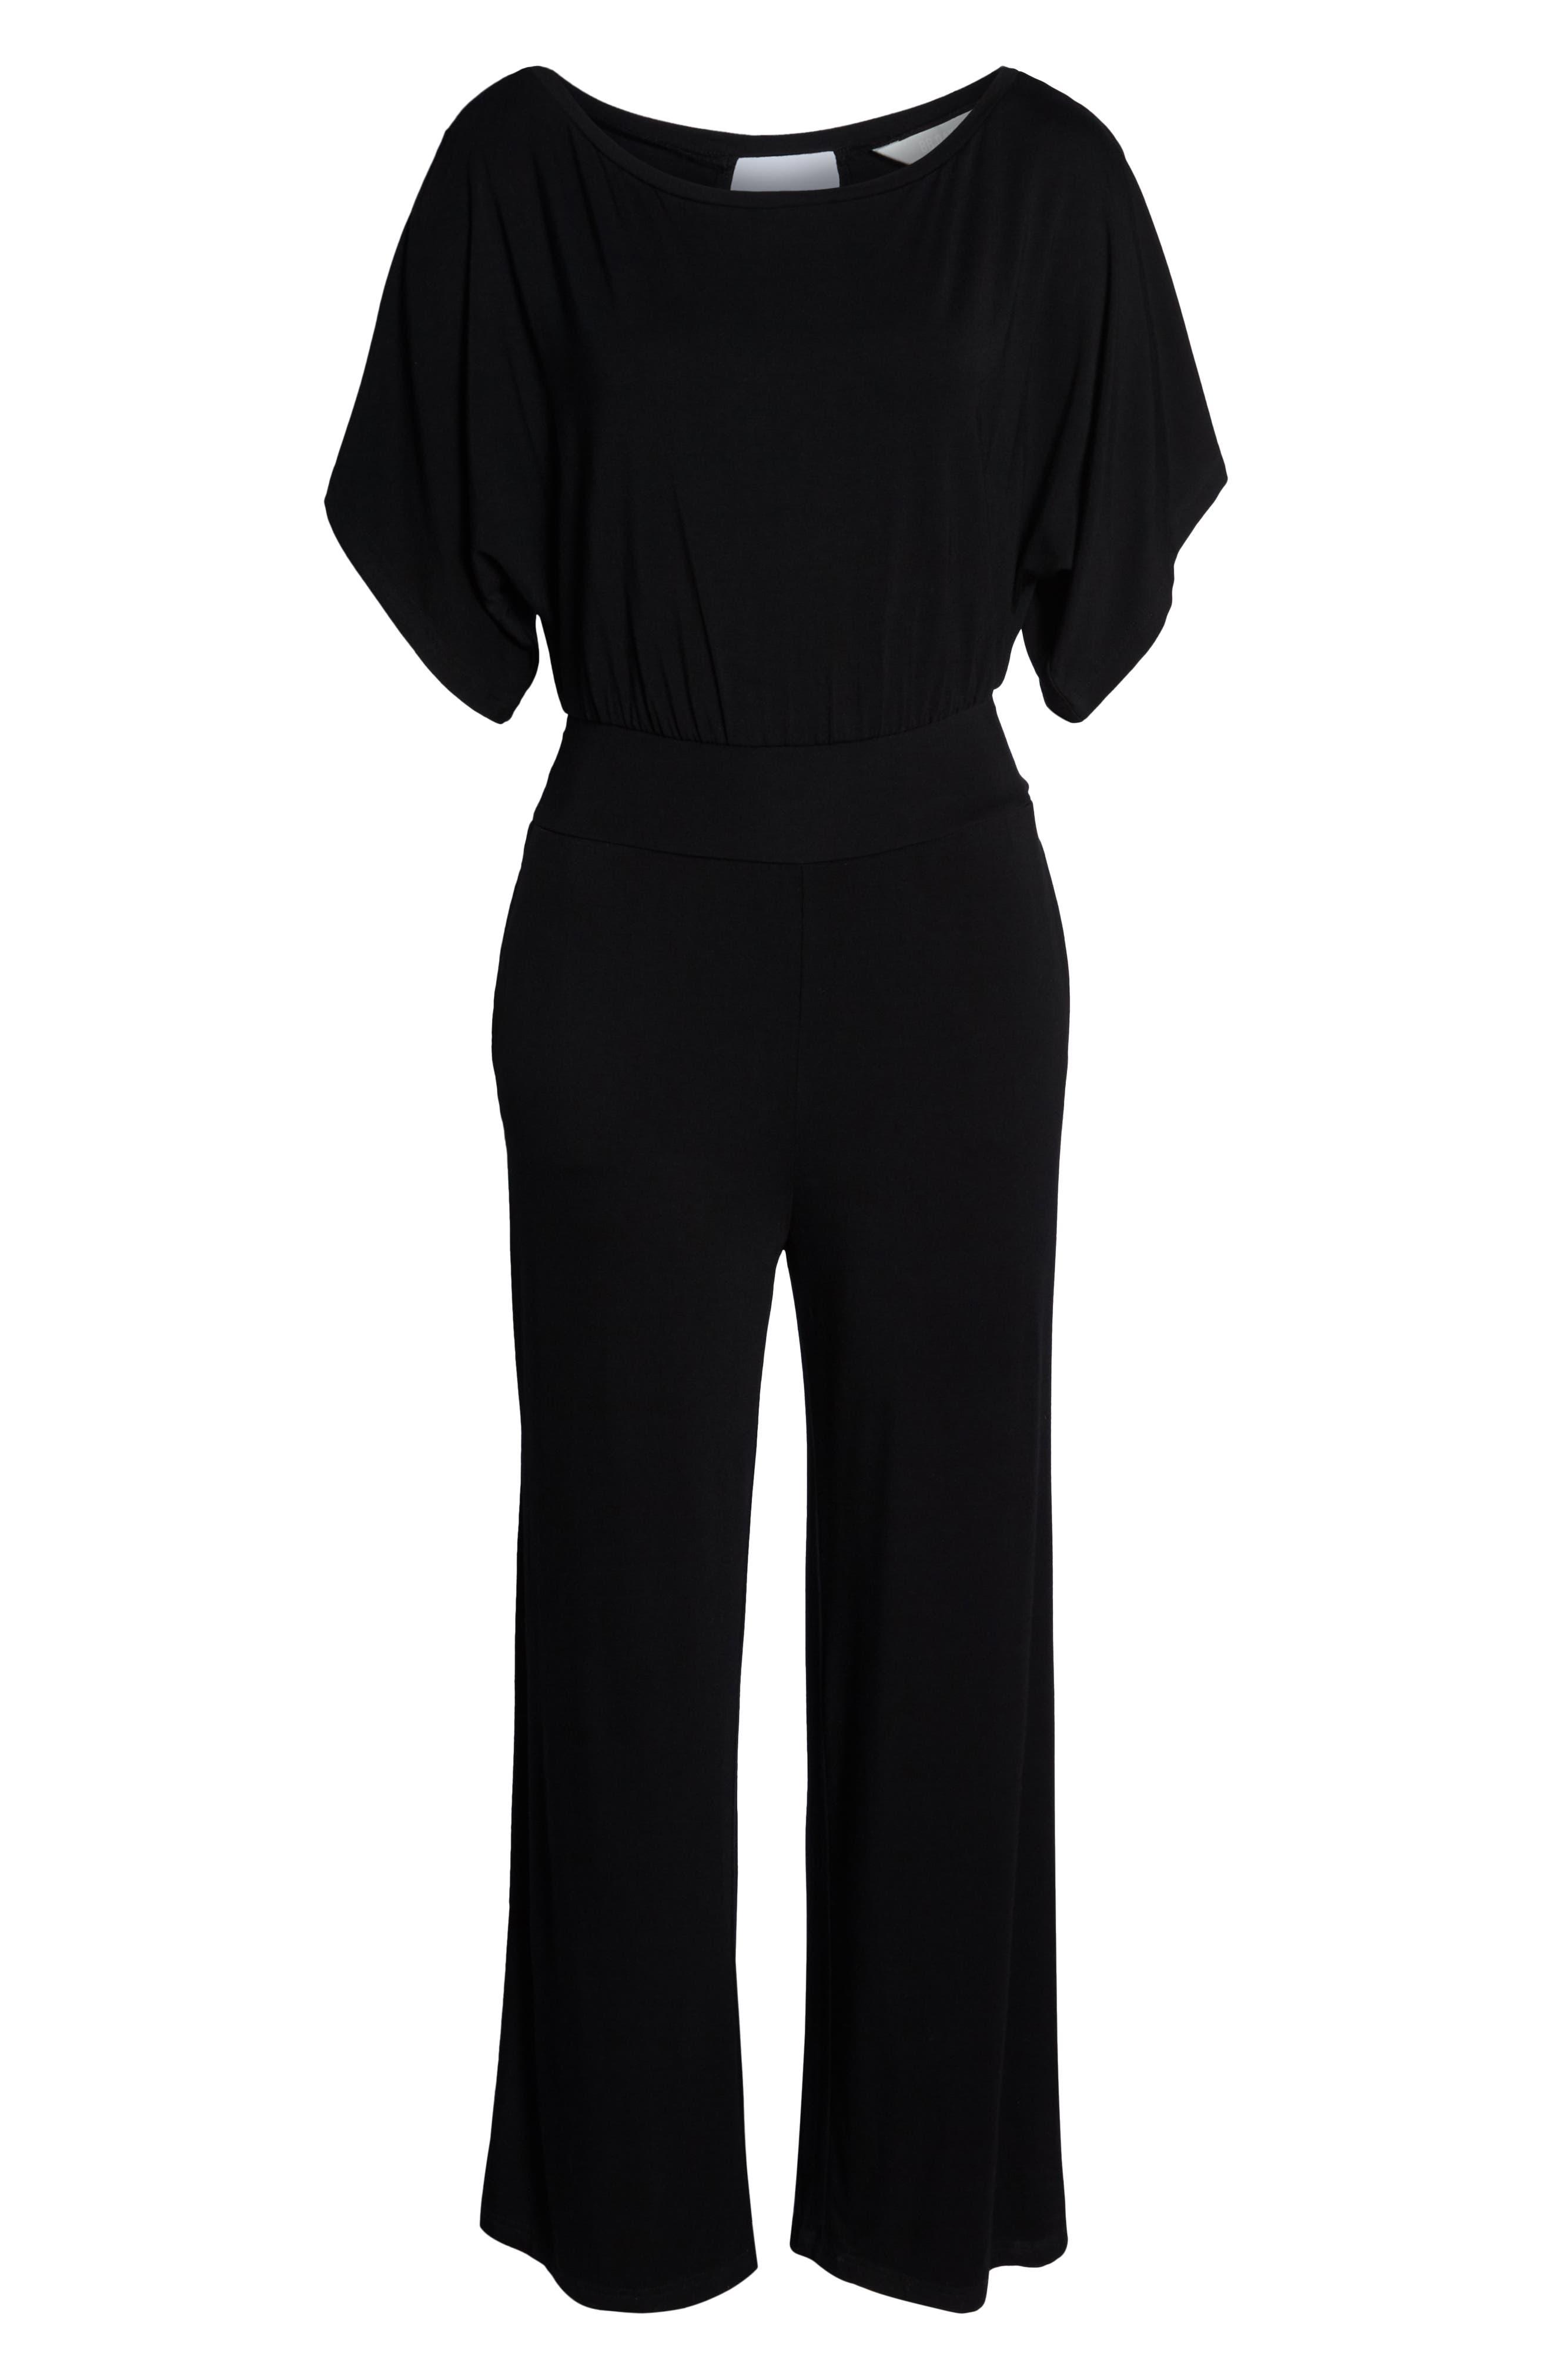 Hottie Off Duty Split Sleeve Jumpsuit,                             Alternate thumbnail 6, color,                             BLACK